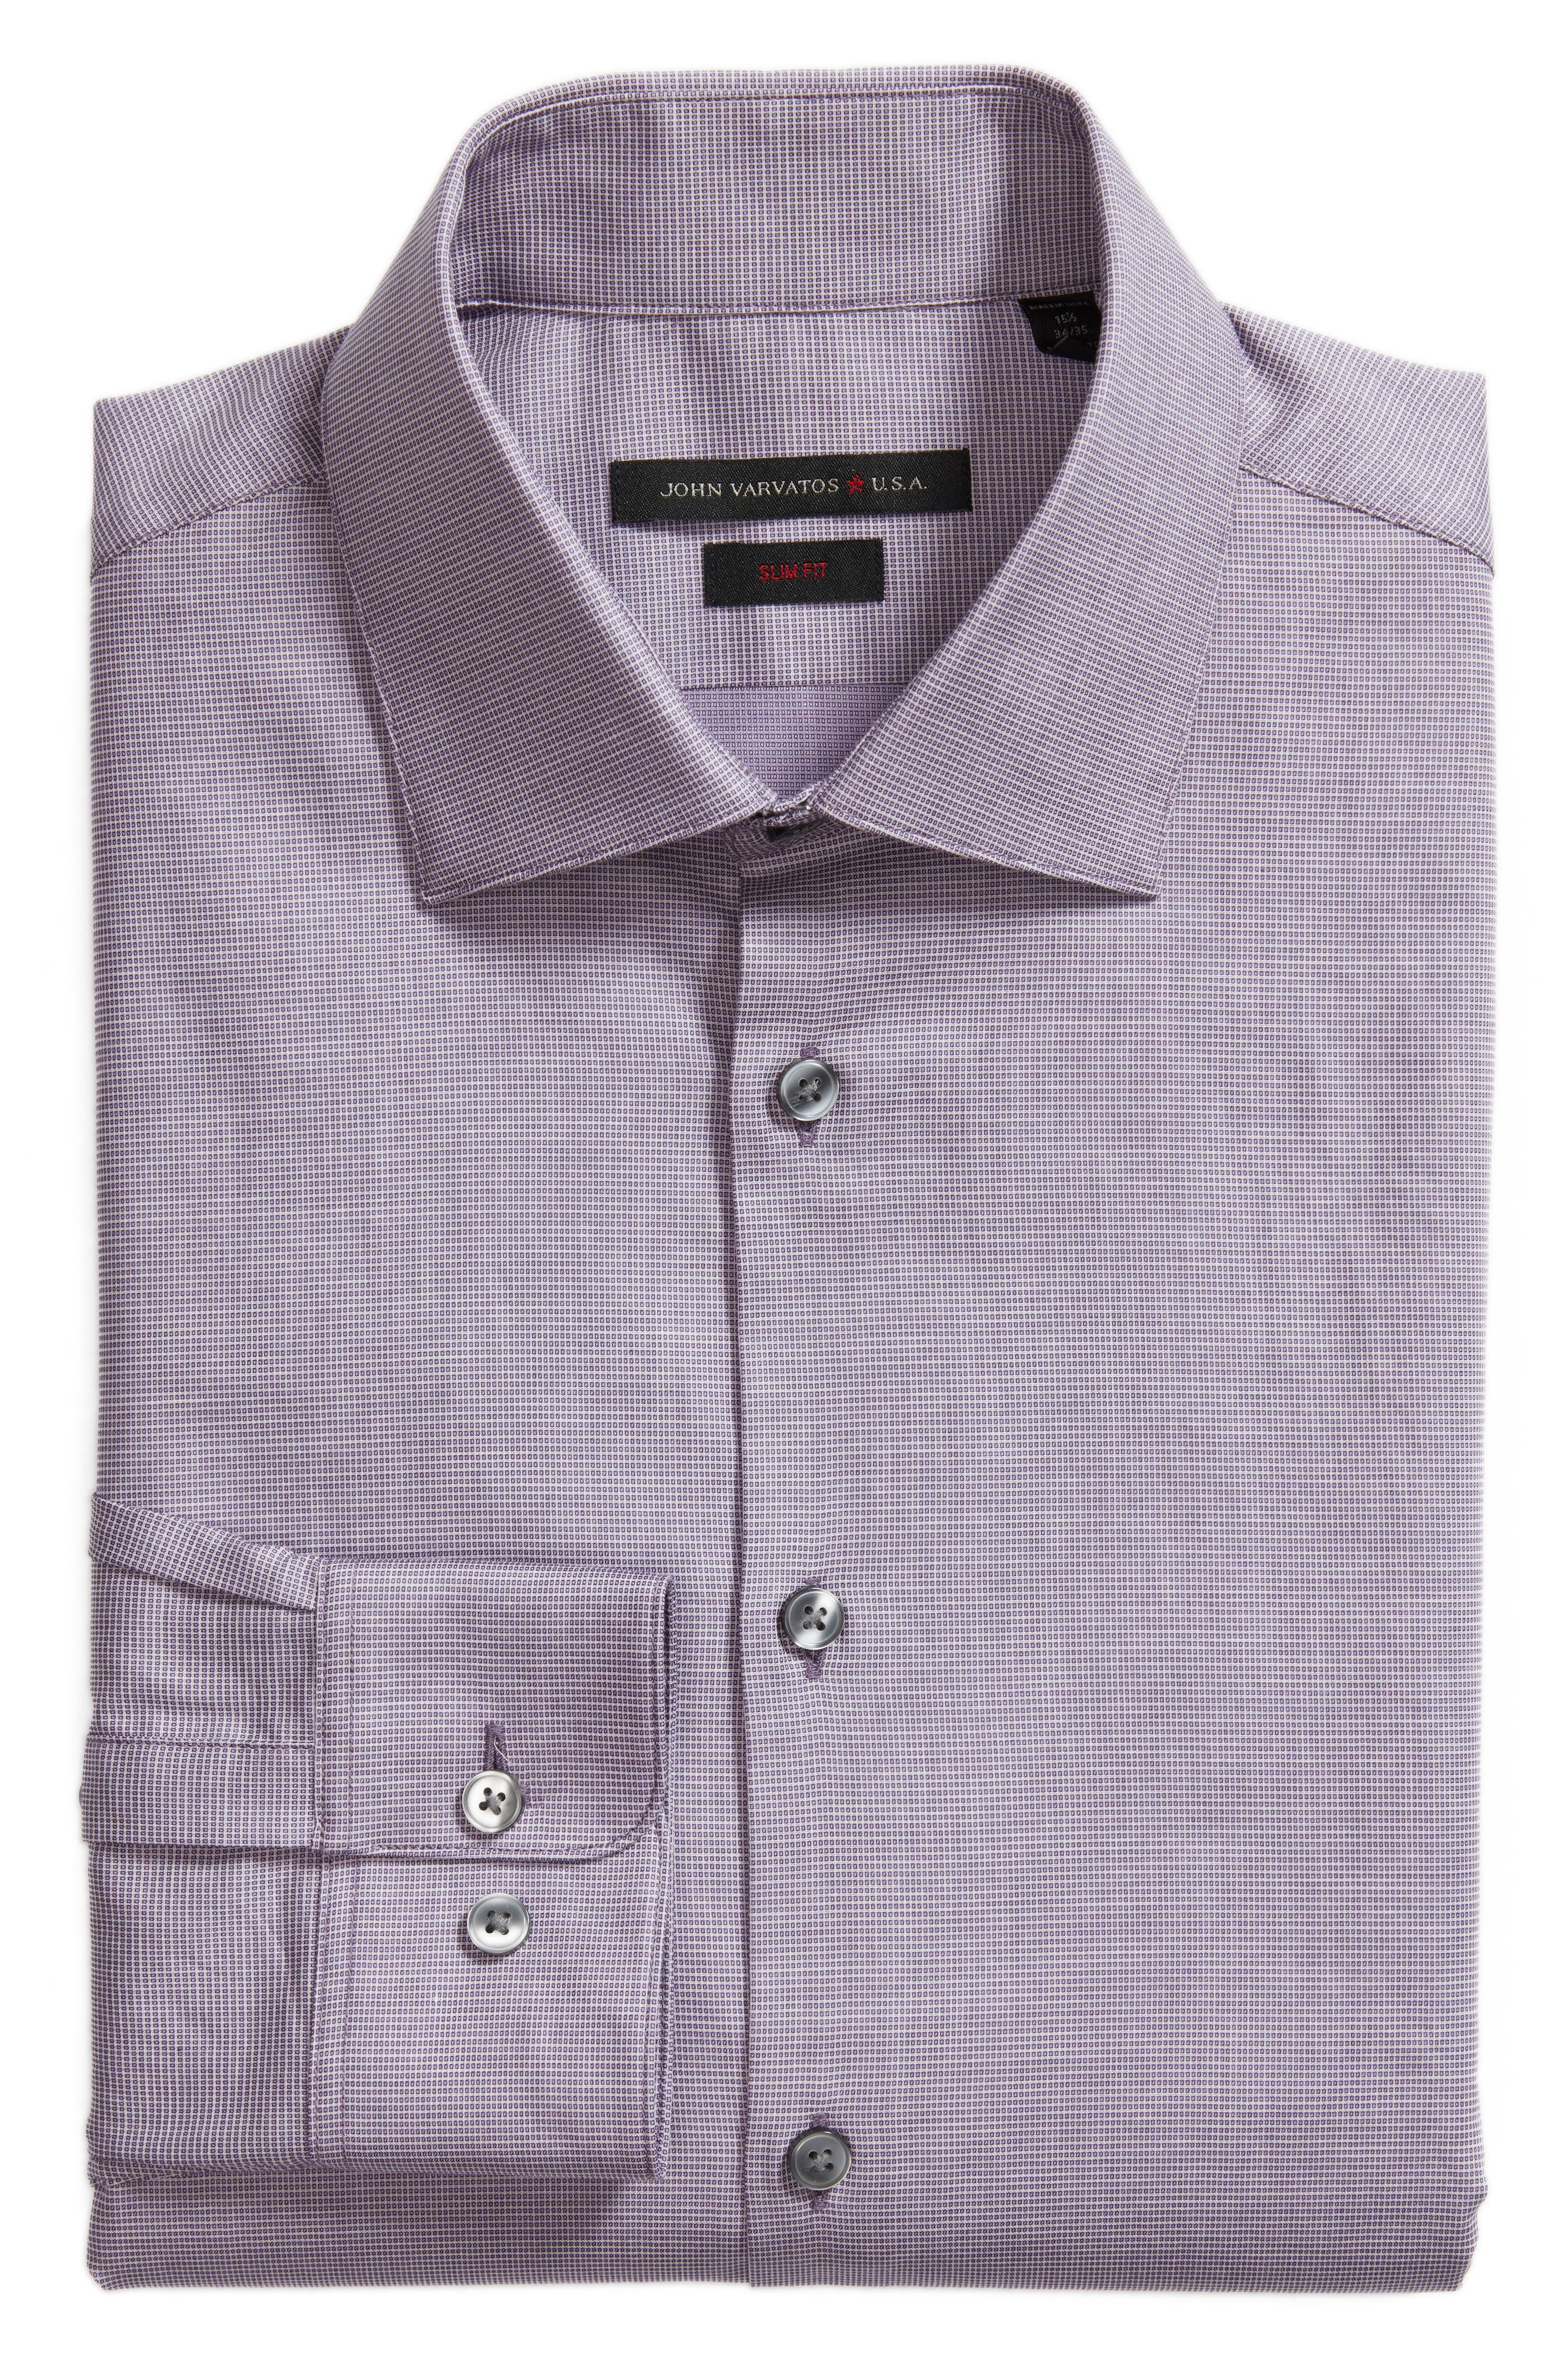 Slim Fit Stretch Microdot Dress Shirt,                             Alternate thumbnail 5, color,                             505